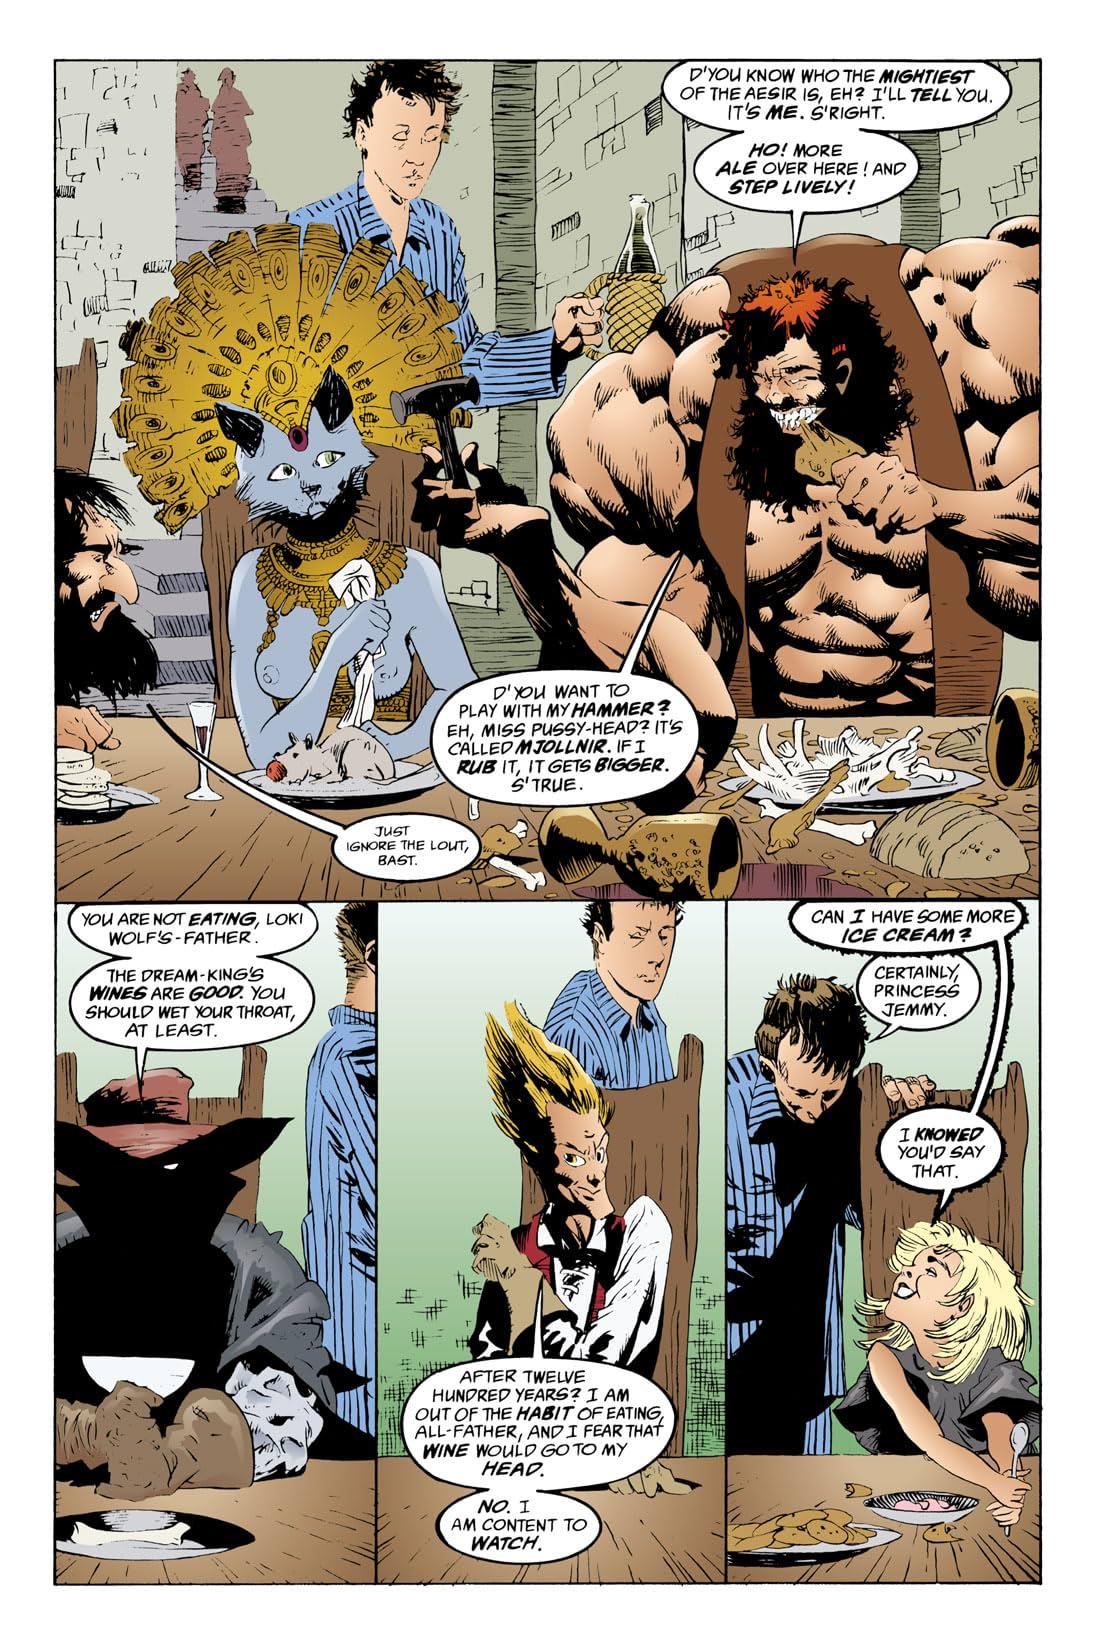 The Sandman #26